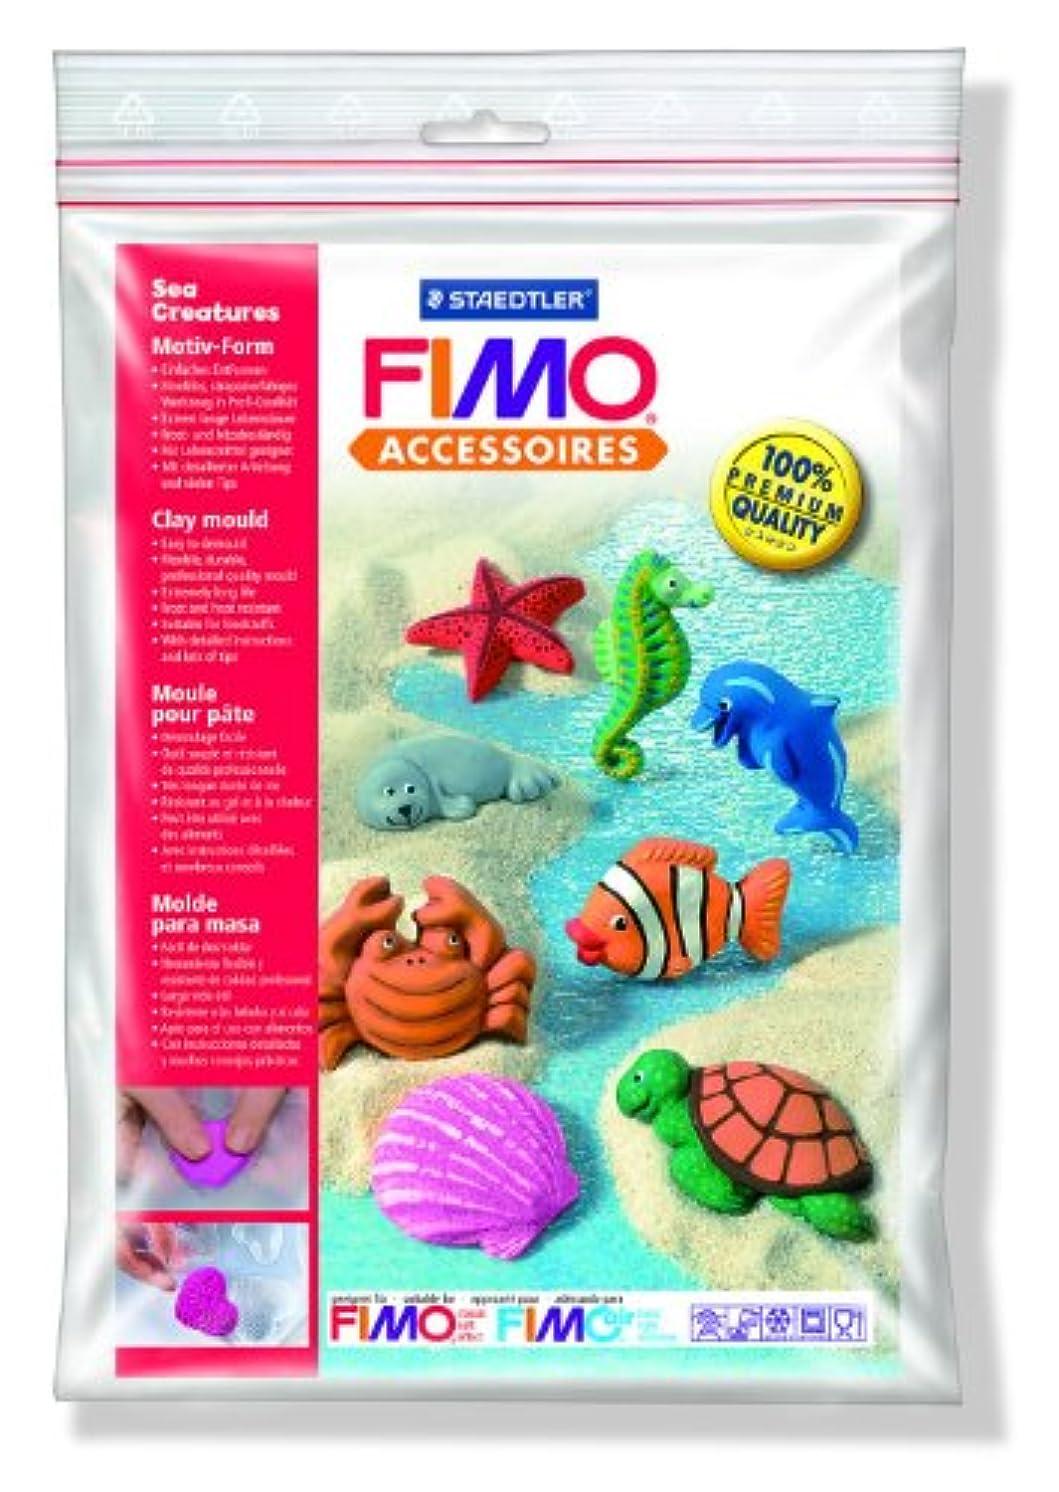 FIMO - Moule pte modeler